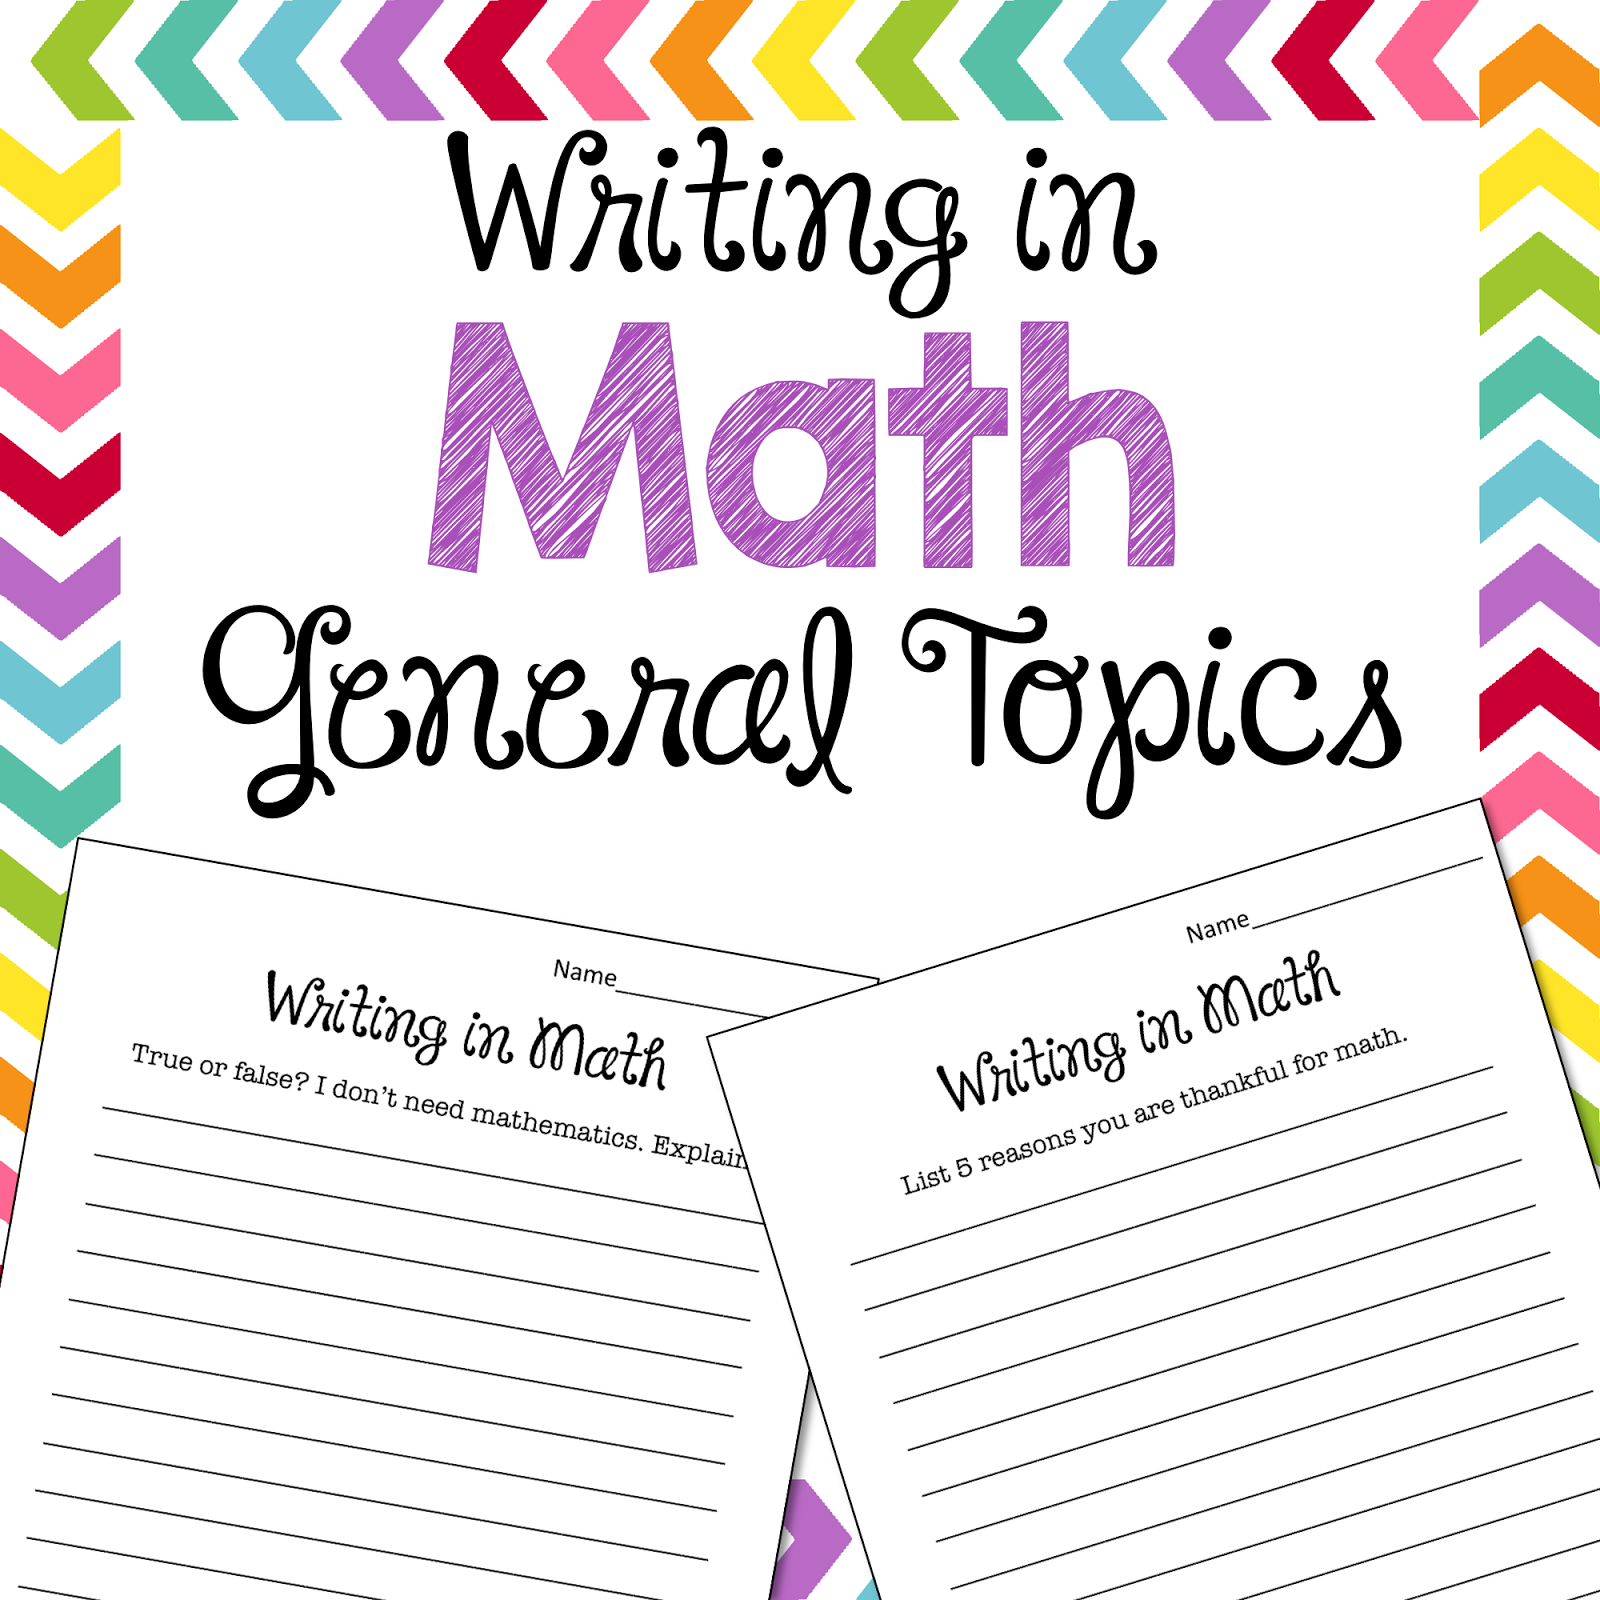 Essay about mathematics